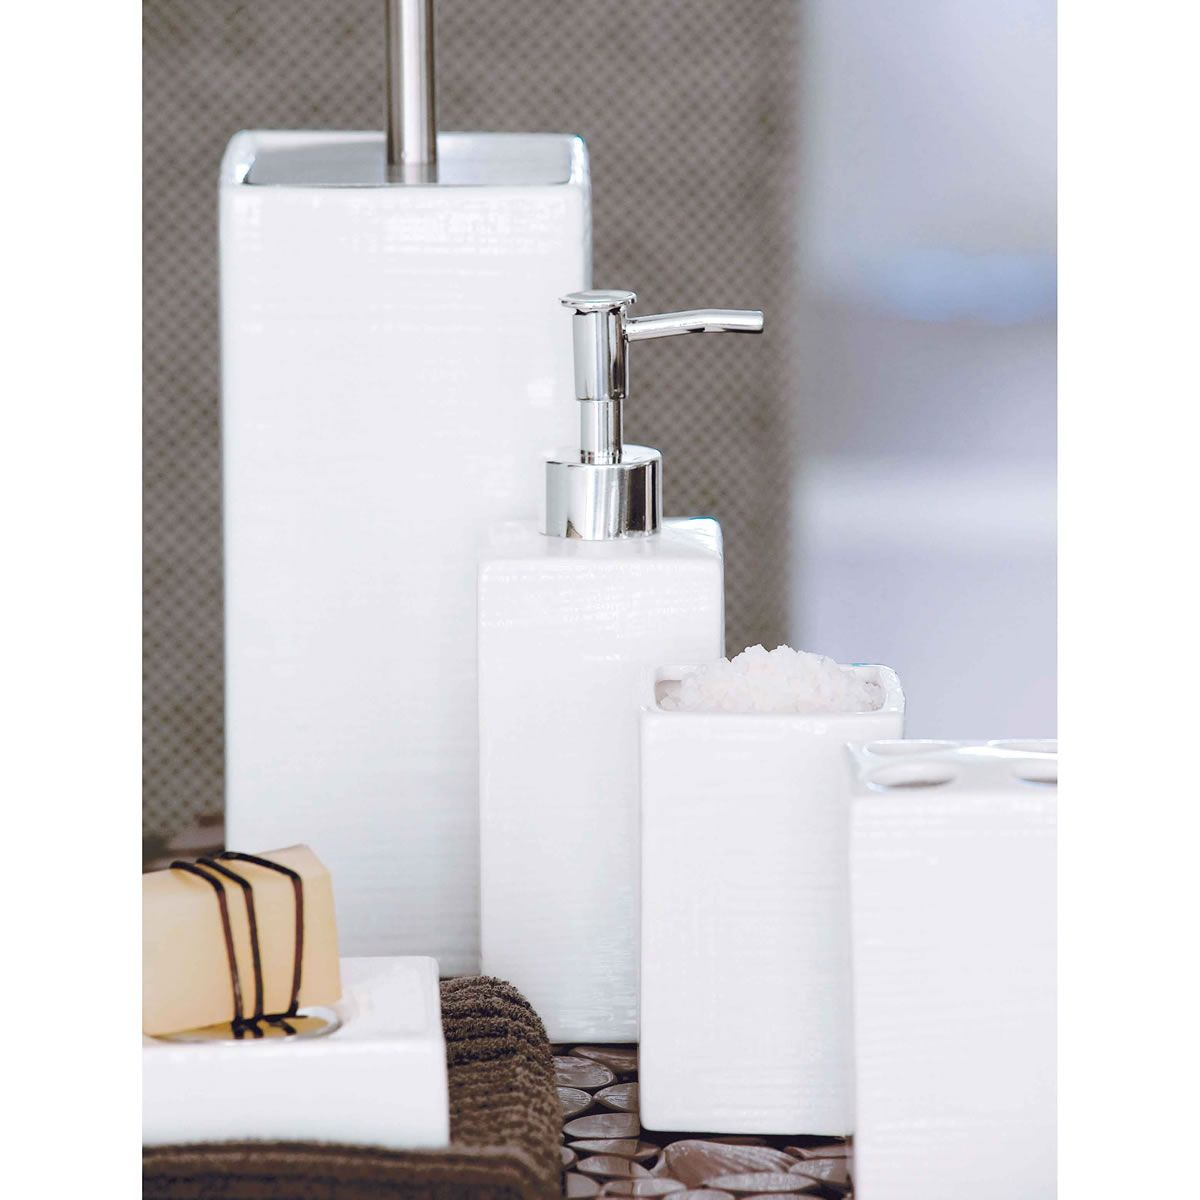 Essentials 5 Piece Bathroom Set White $29.95 | Bathroom ...